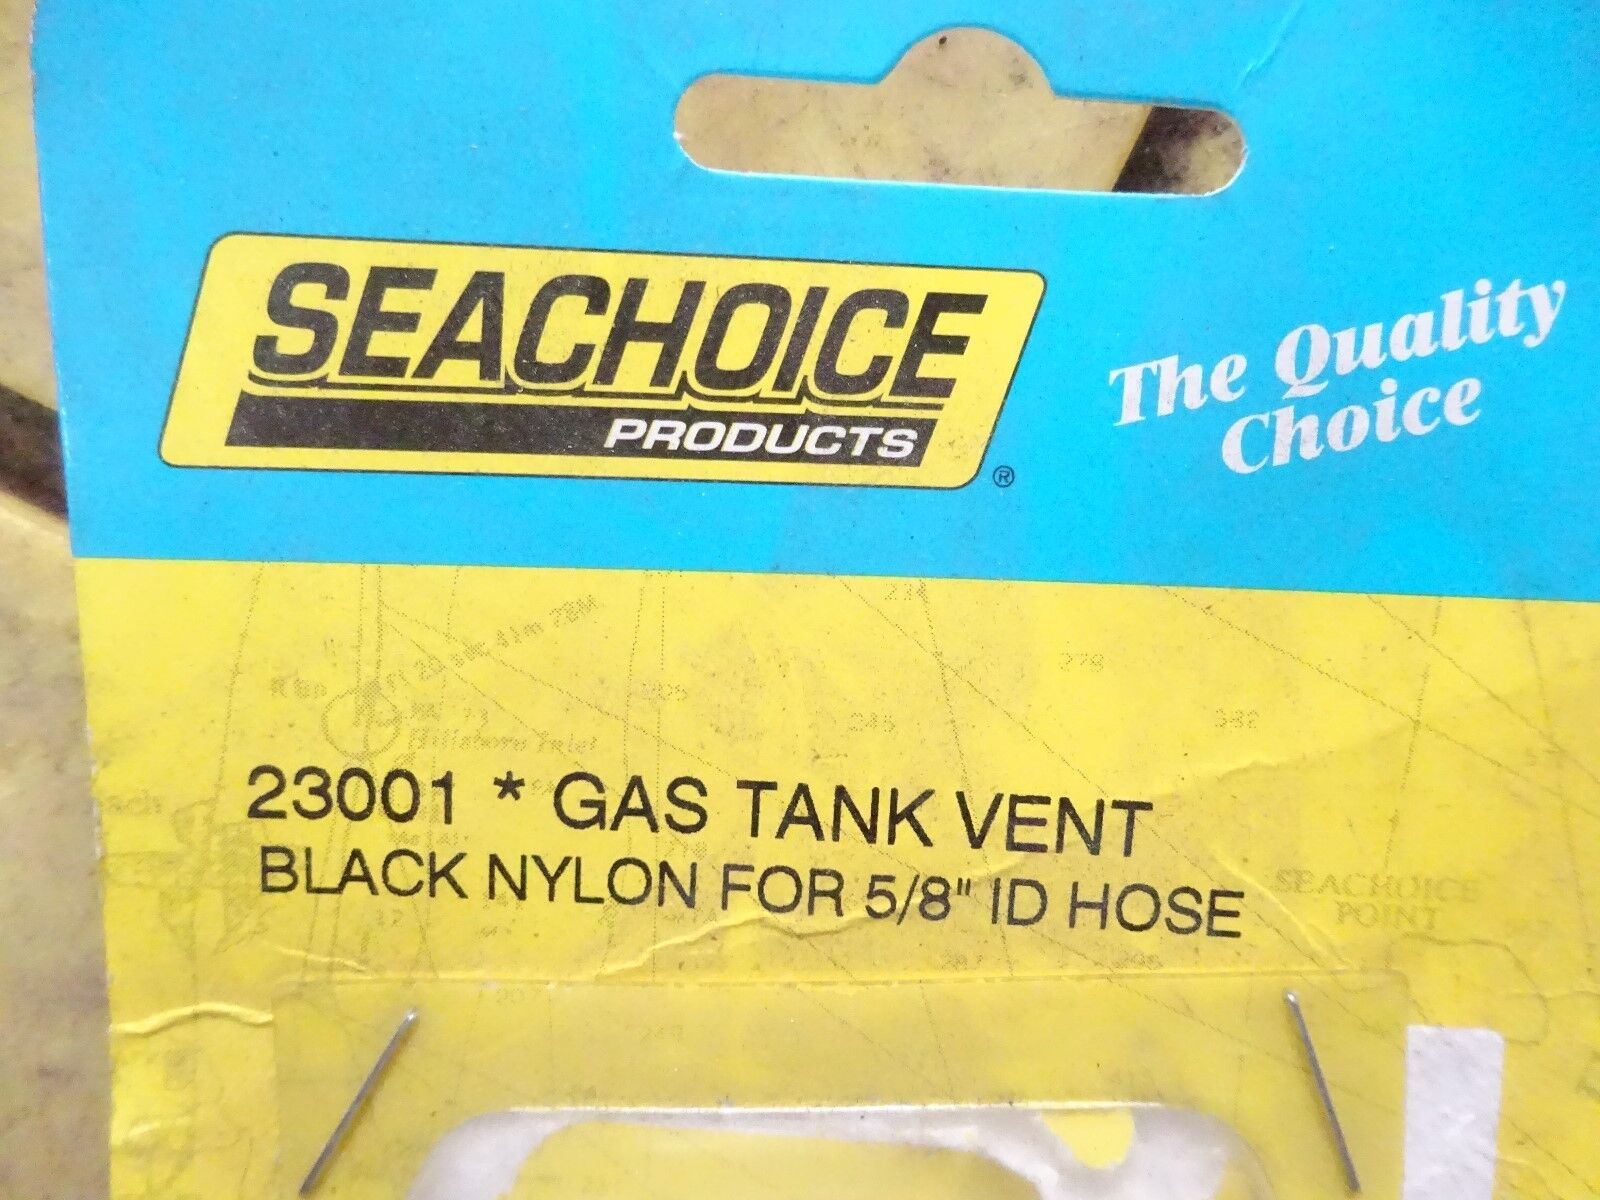 Black Nylon fuel gas tank vent 5//8 in ID hose boat marine straight square 23001